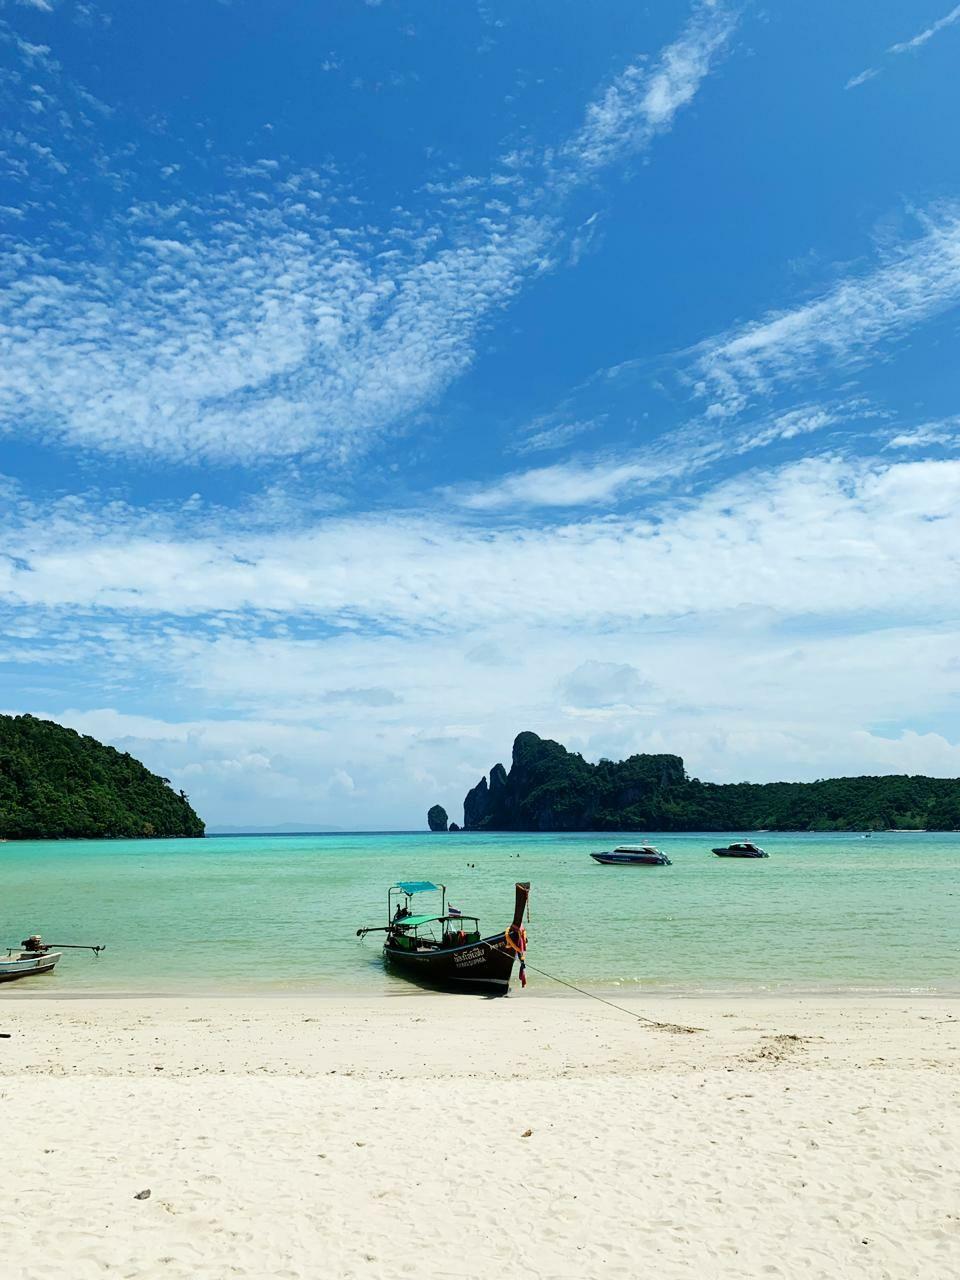 Photo of Thailand By Prateek Songara